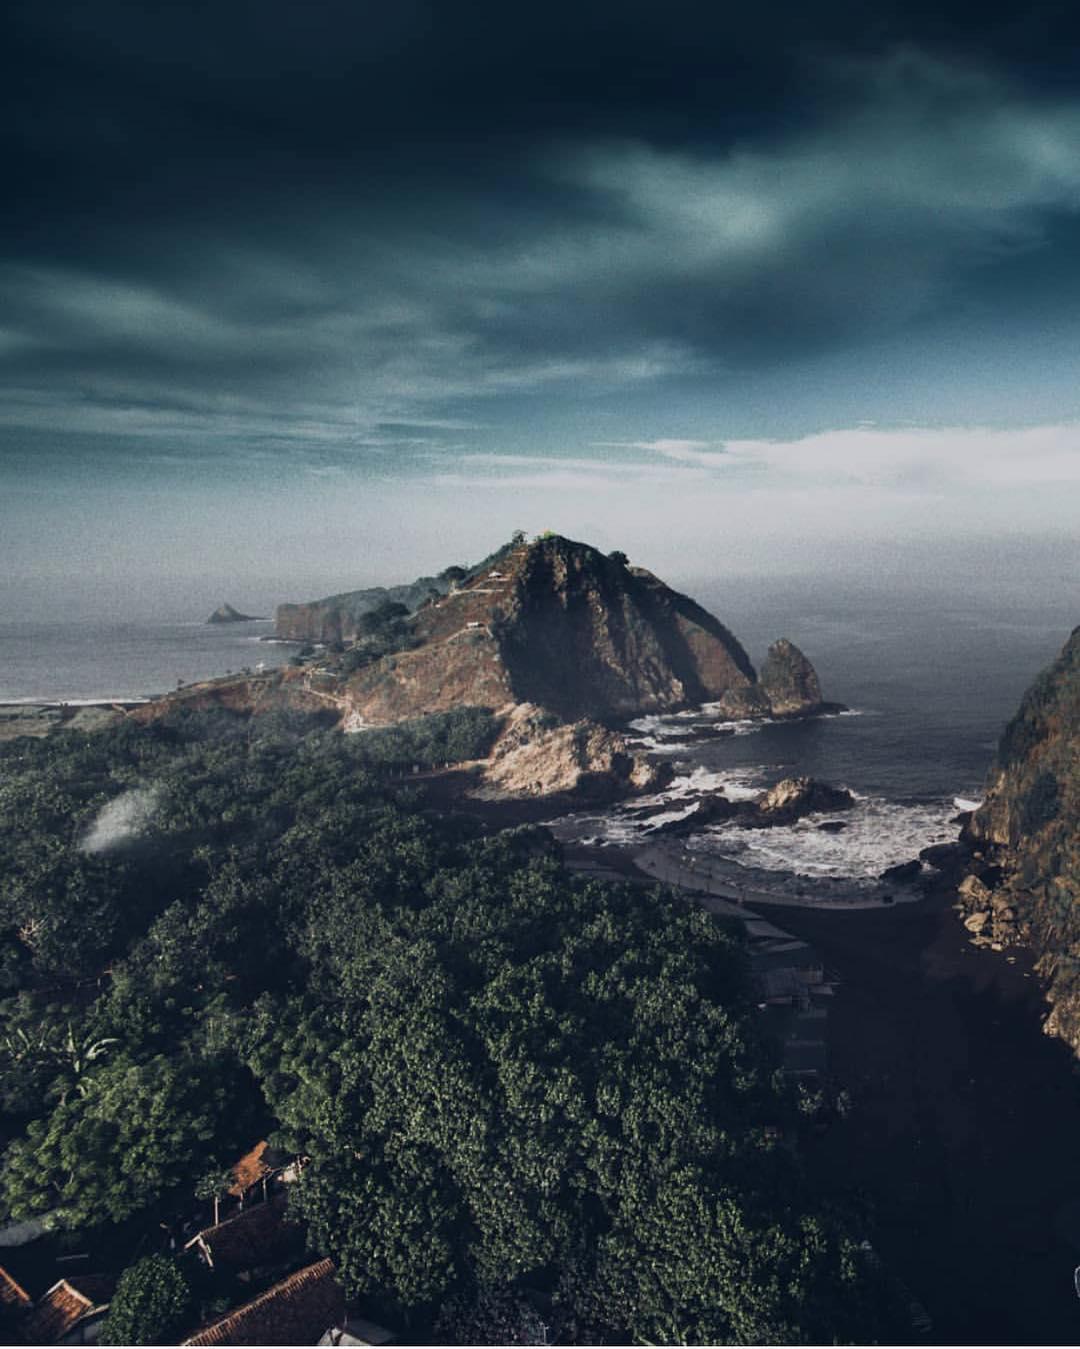 Wisata Jakarta Terbaru 2021: Destinasi Wisata Jember Terbaru